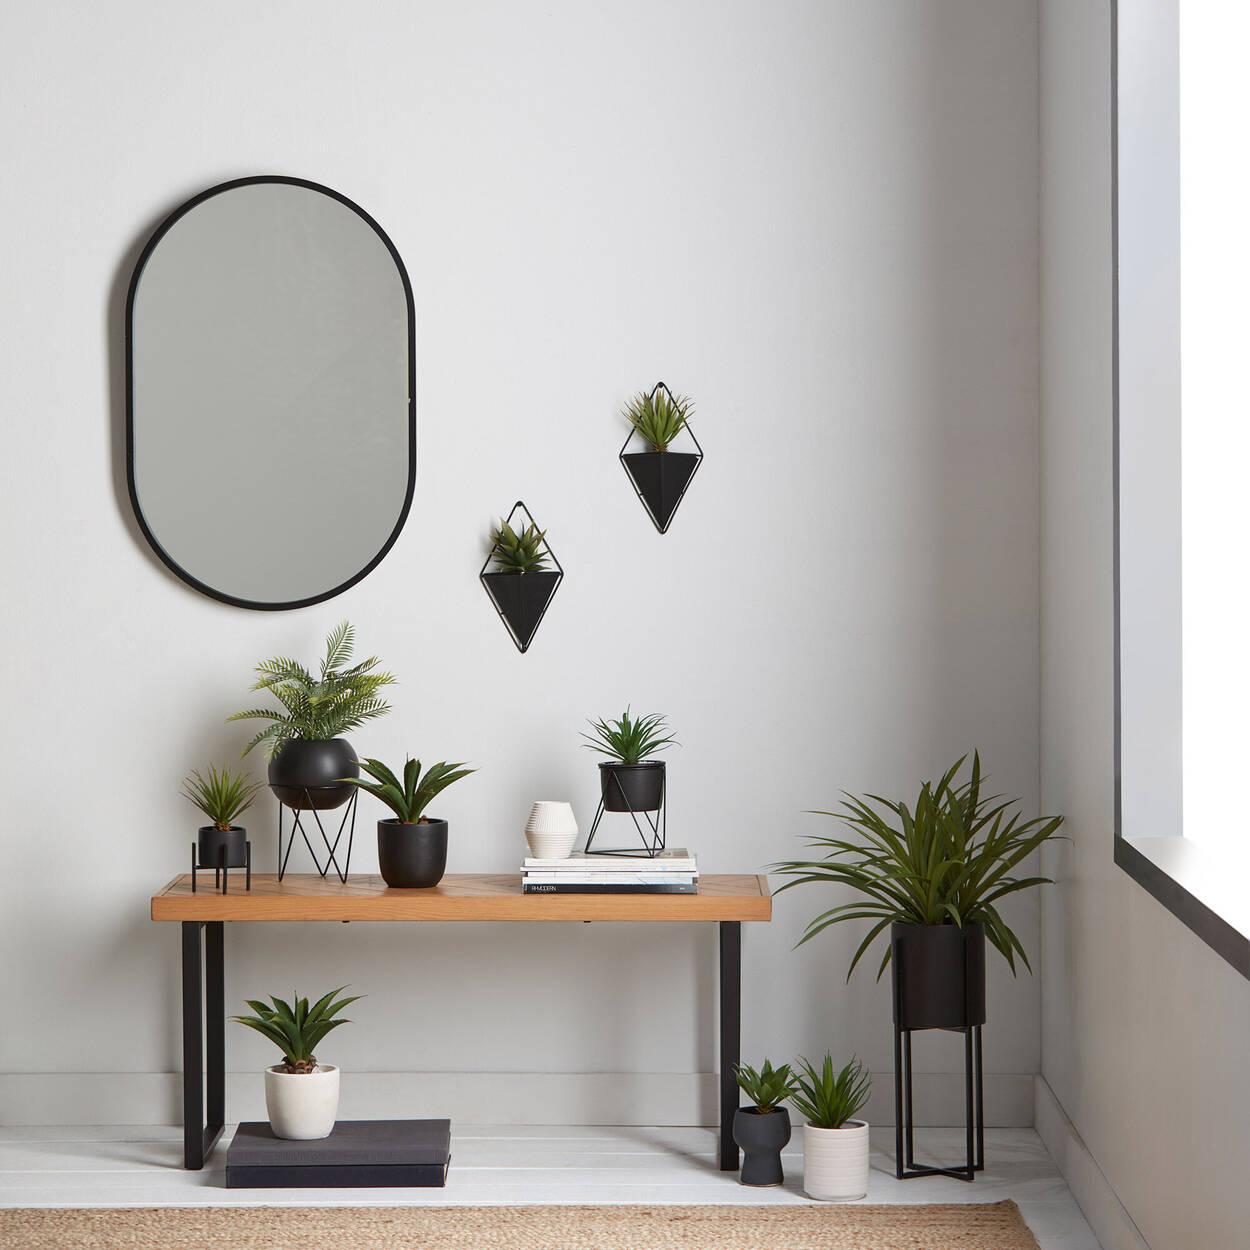 Plante succulente sur pied